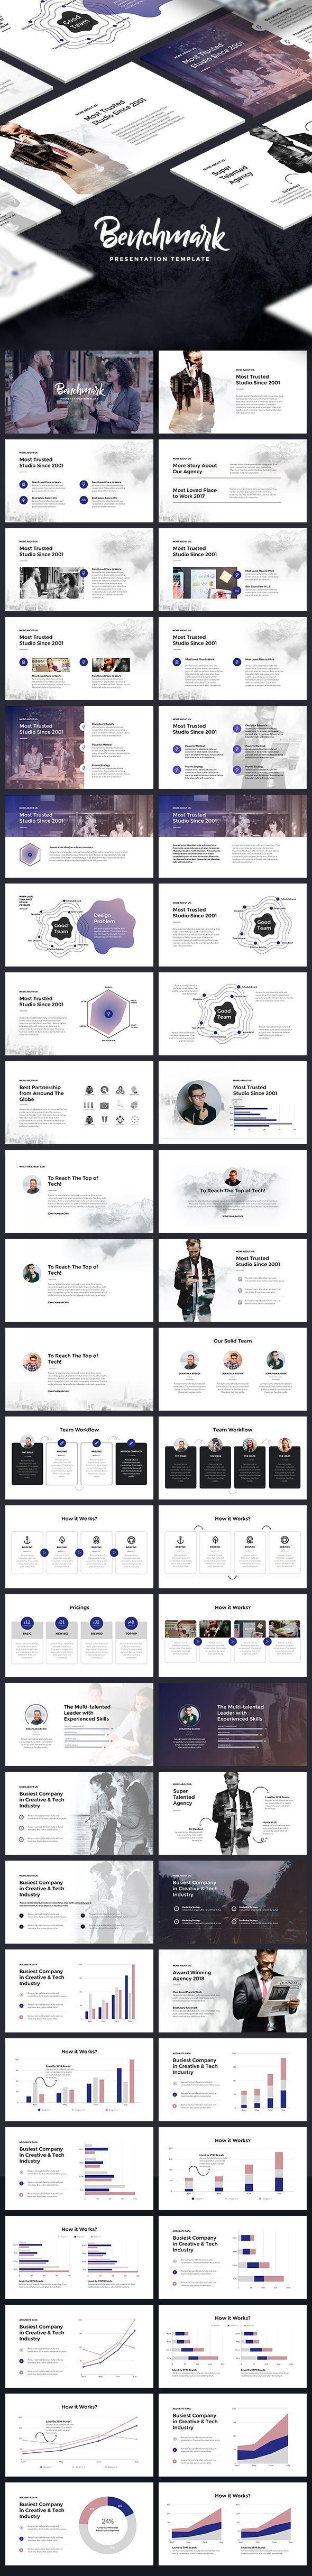 Benchmark - Modern Keynote Template   PowerPoint Keynote ...